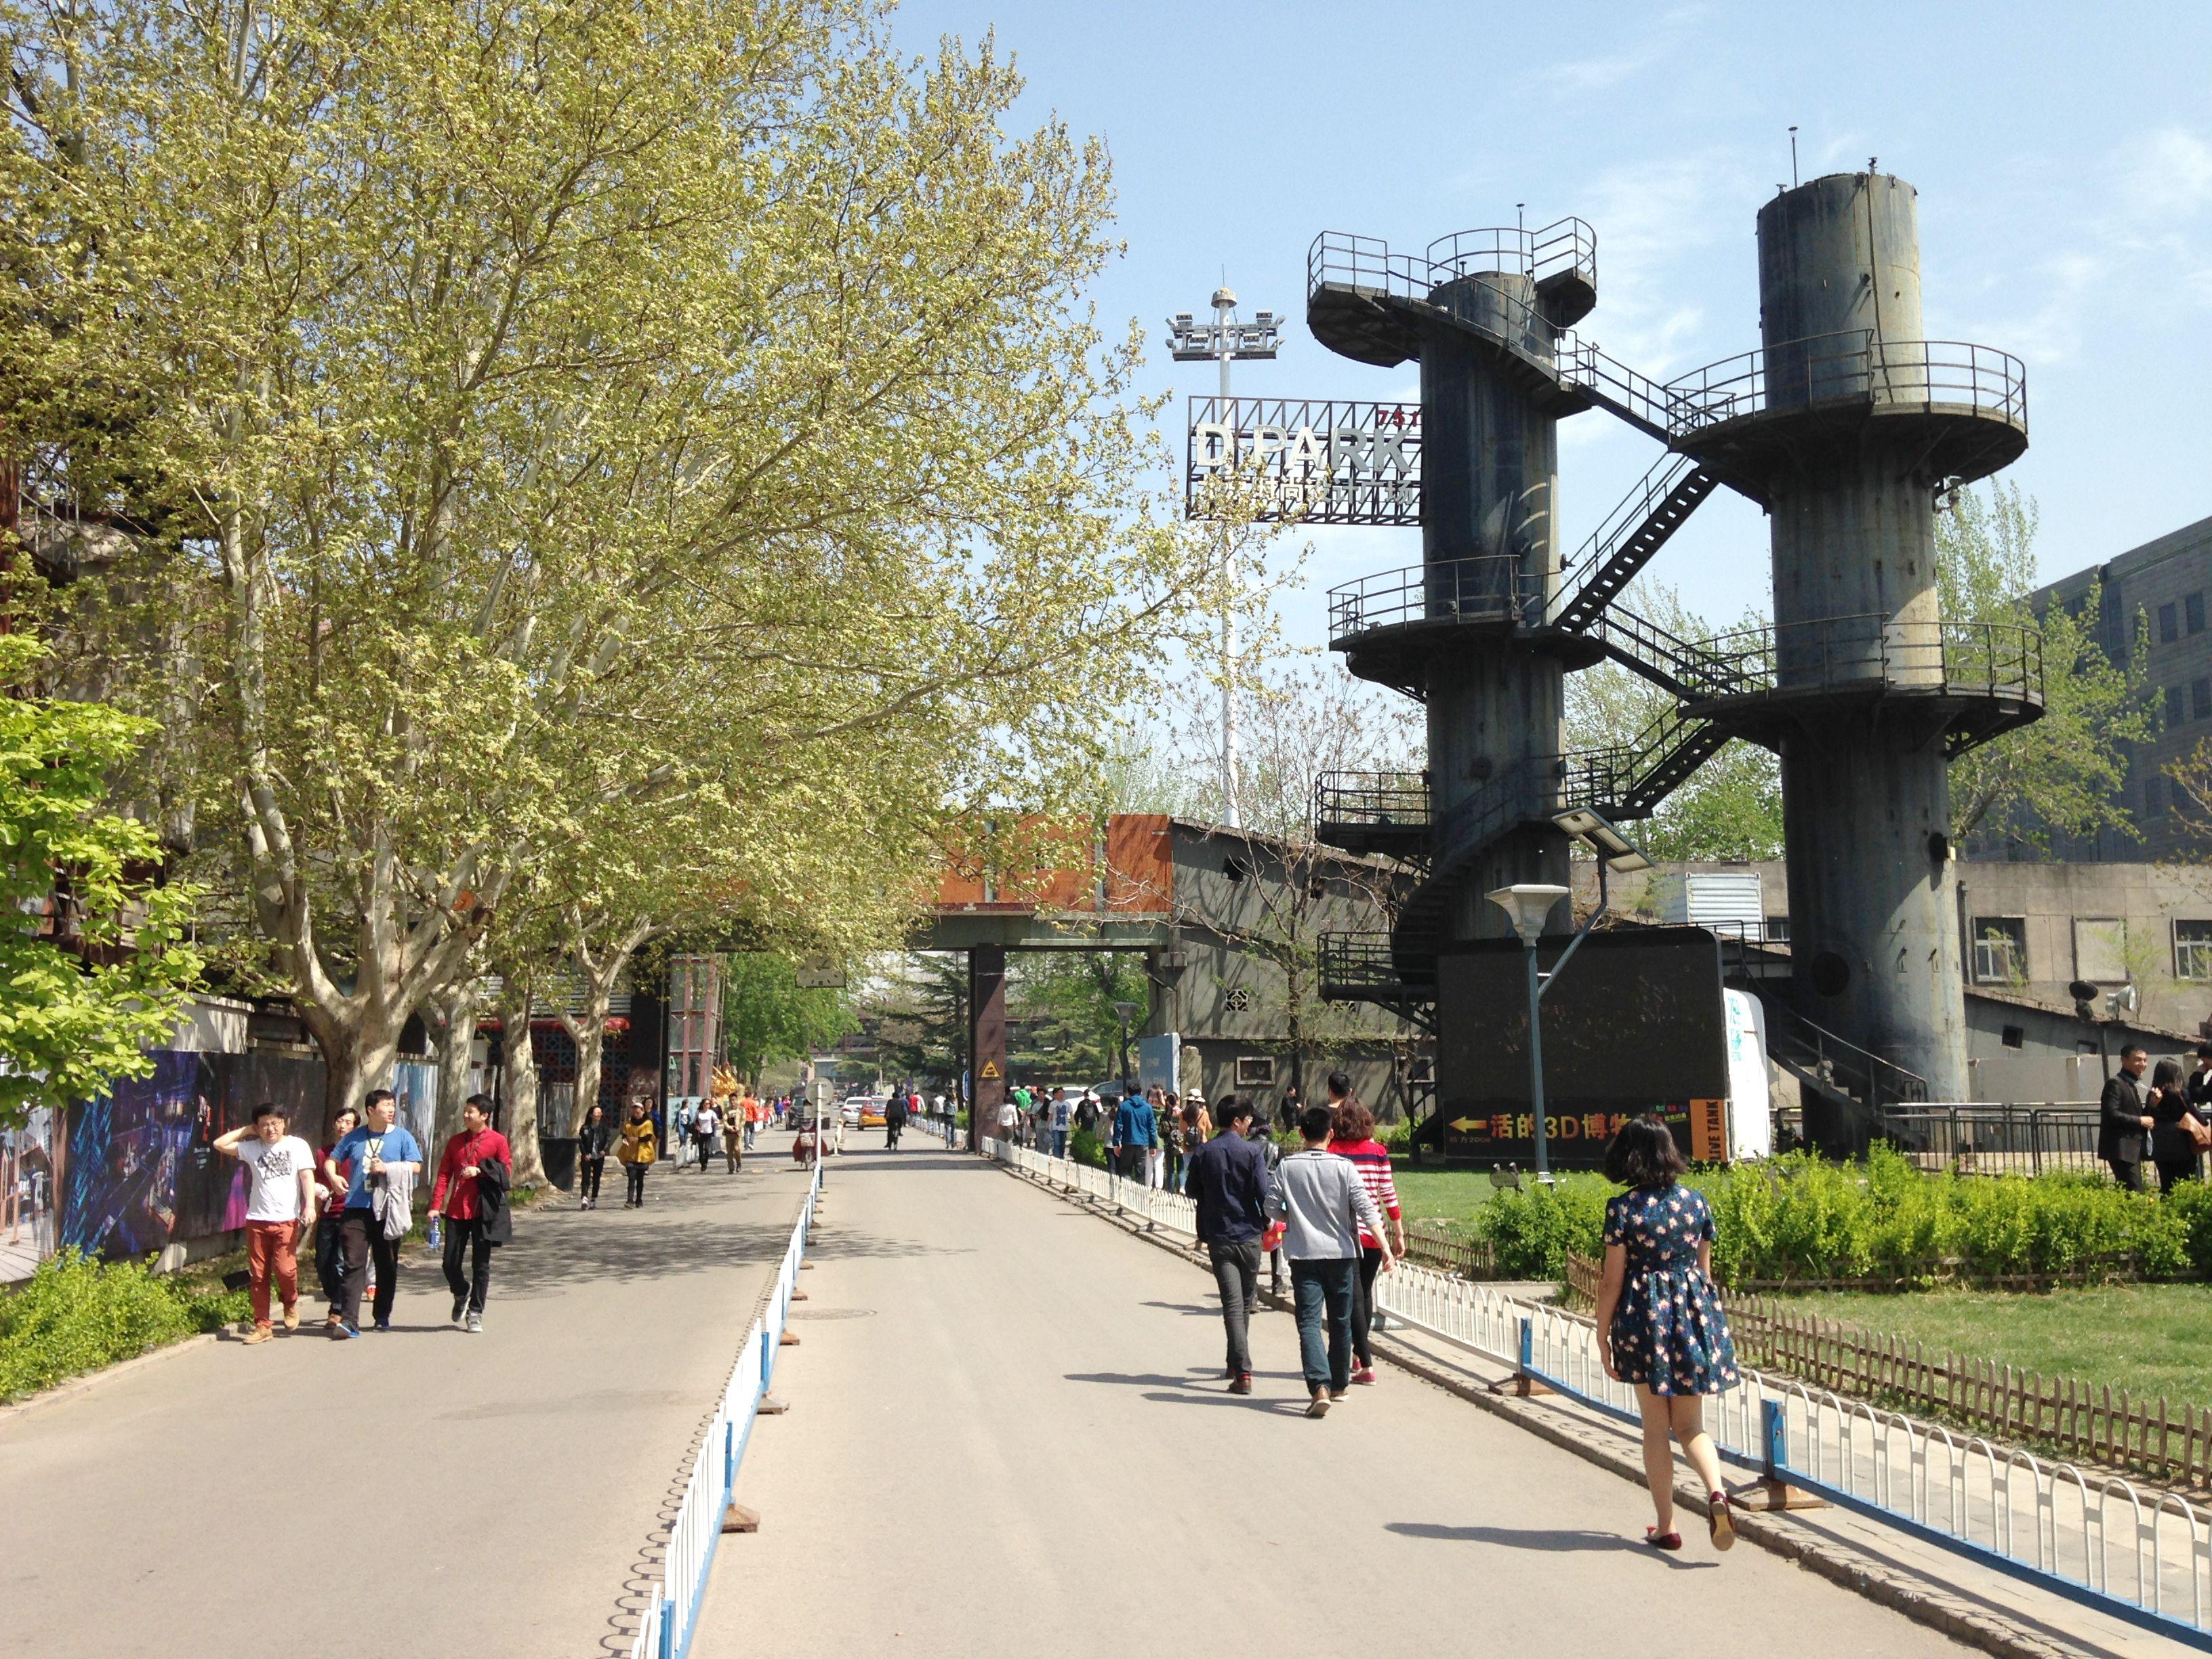 People strolling around 798 Art District in Beijing